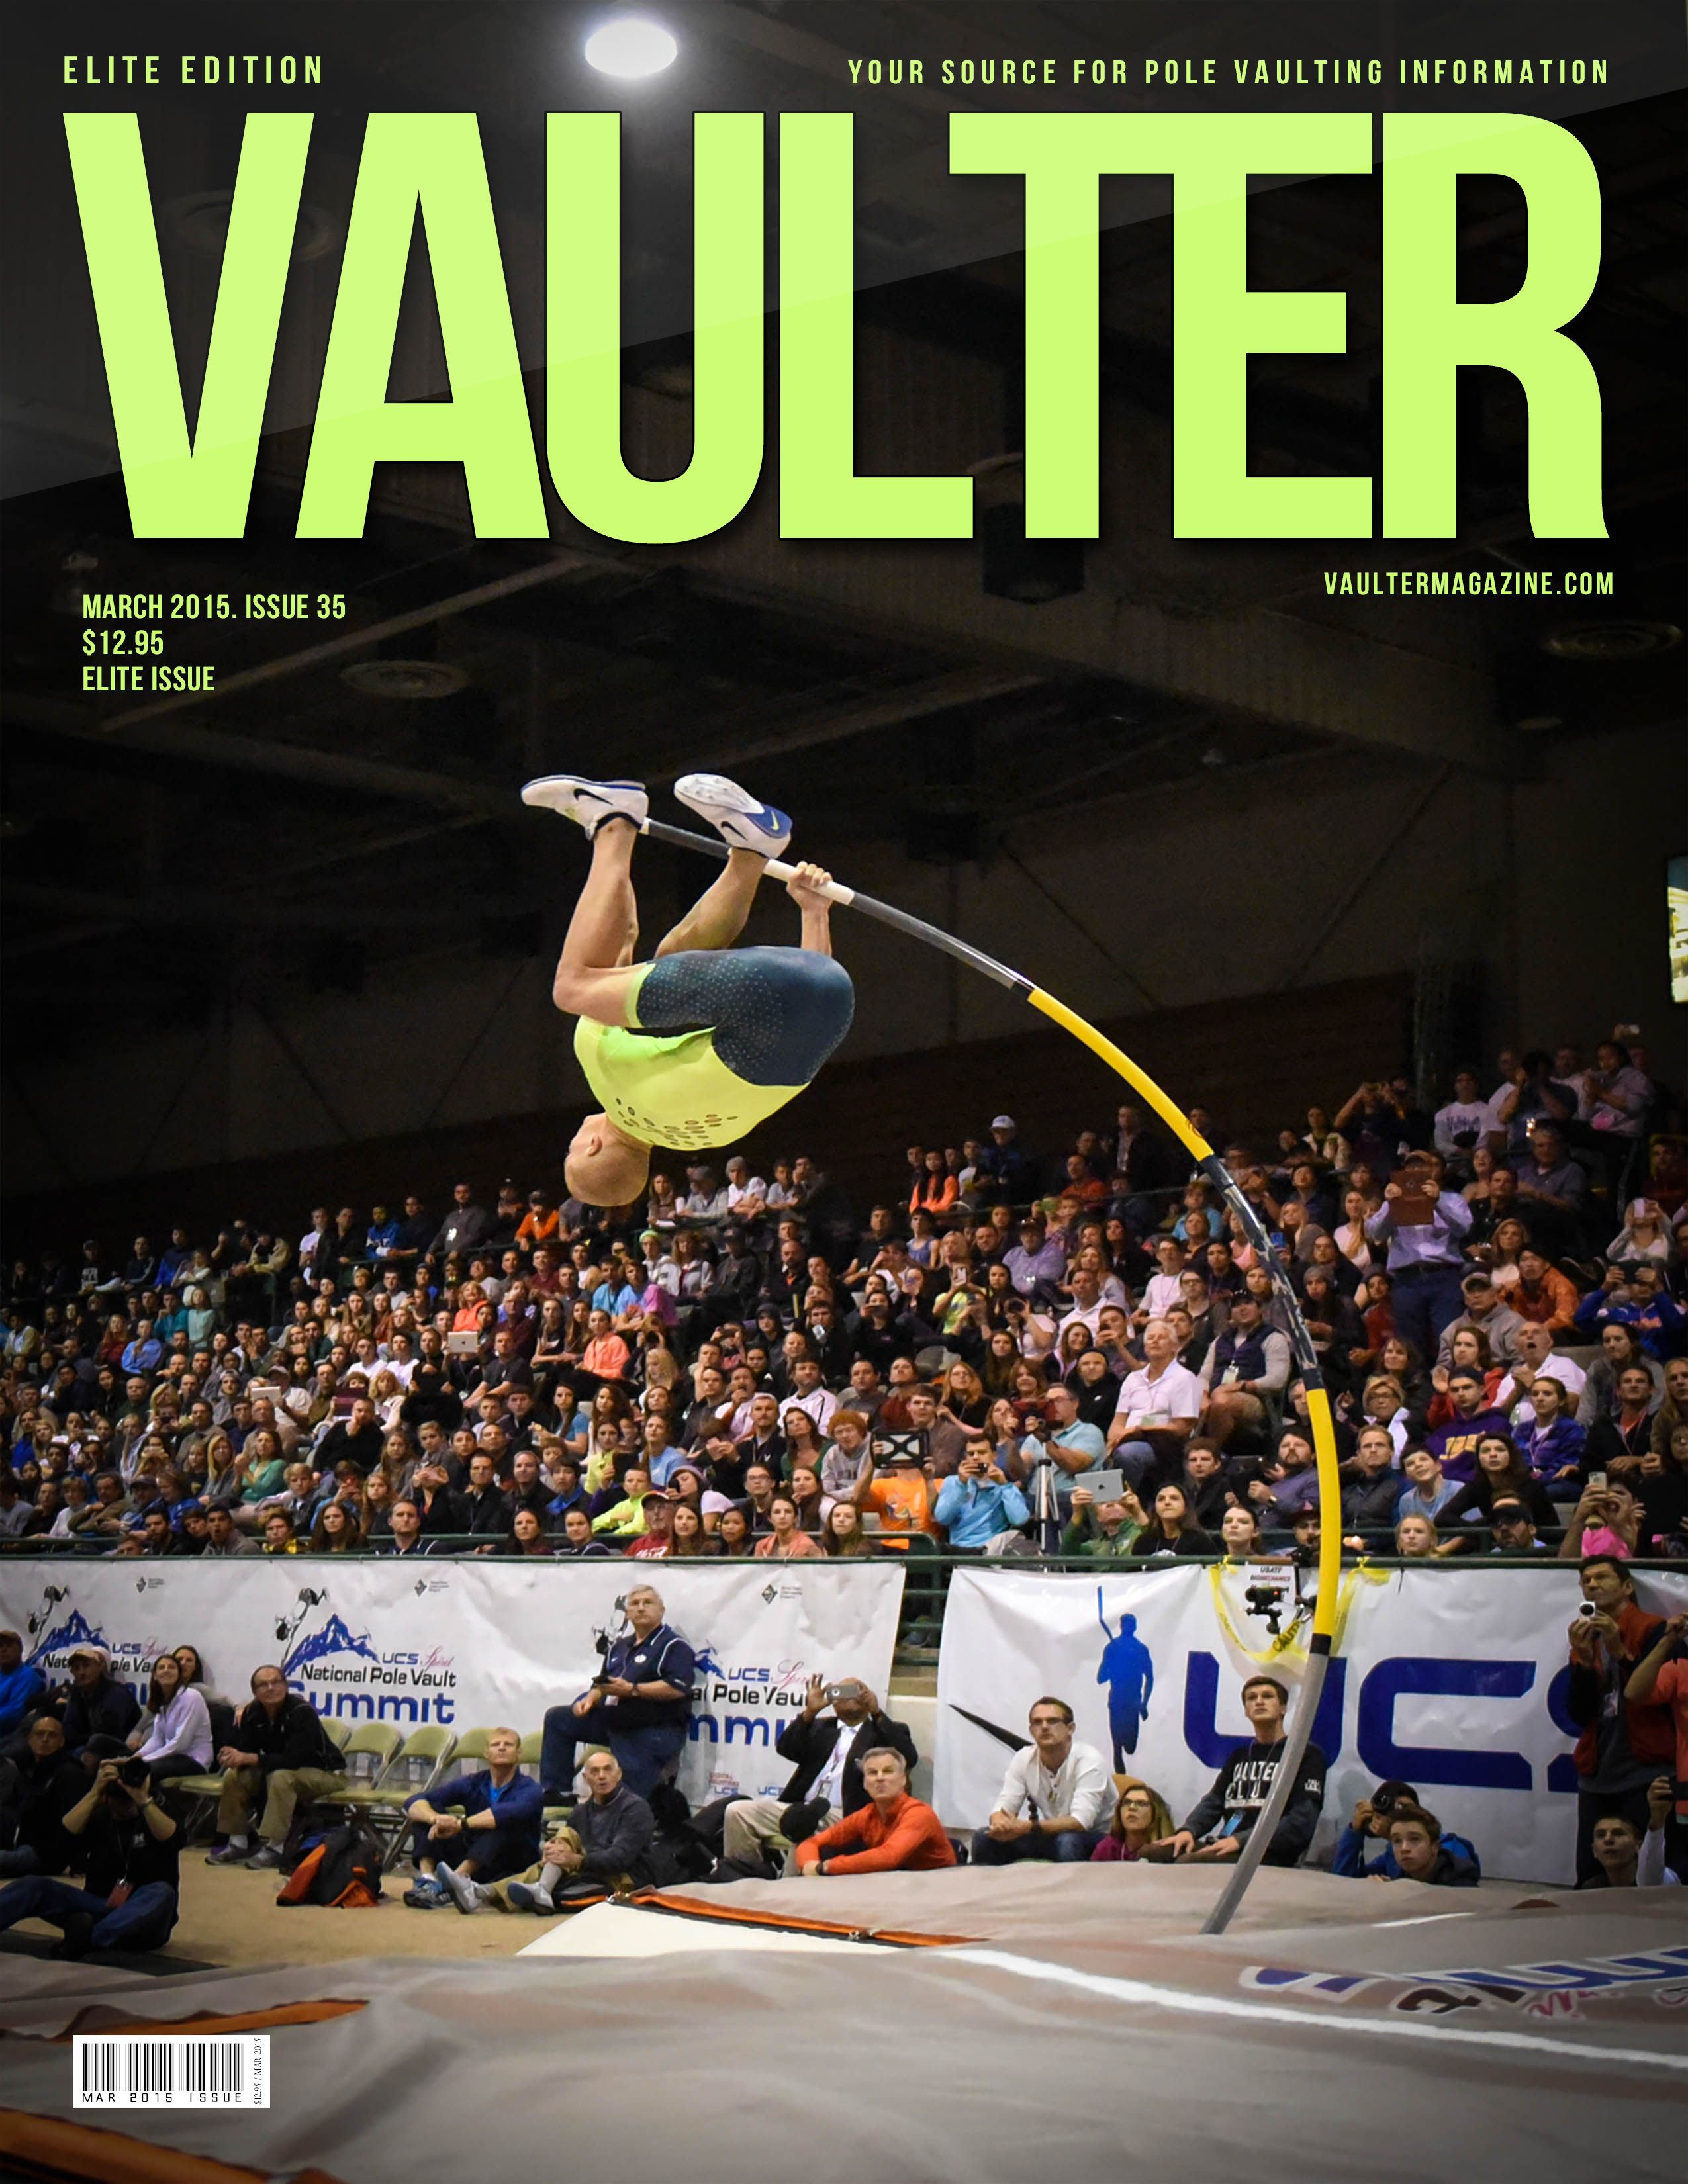 March 2015 Sam Kendricks Magazine On Sale Now Pole Vault Track And Field Vaulting